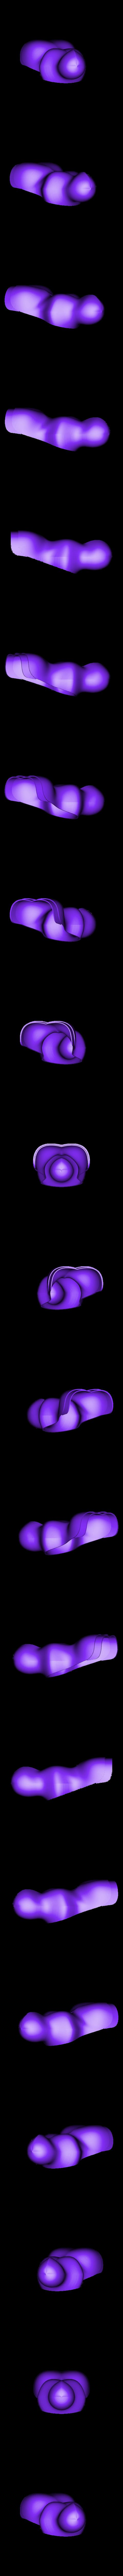 matriochka v3 a N1.stl Télécharger fichier STL gratuit WHITE MATRIOCHKA • Design pour impression 3D, DJER